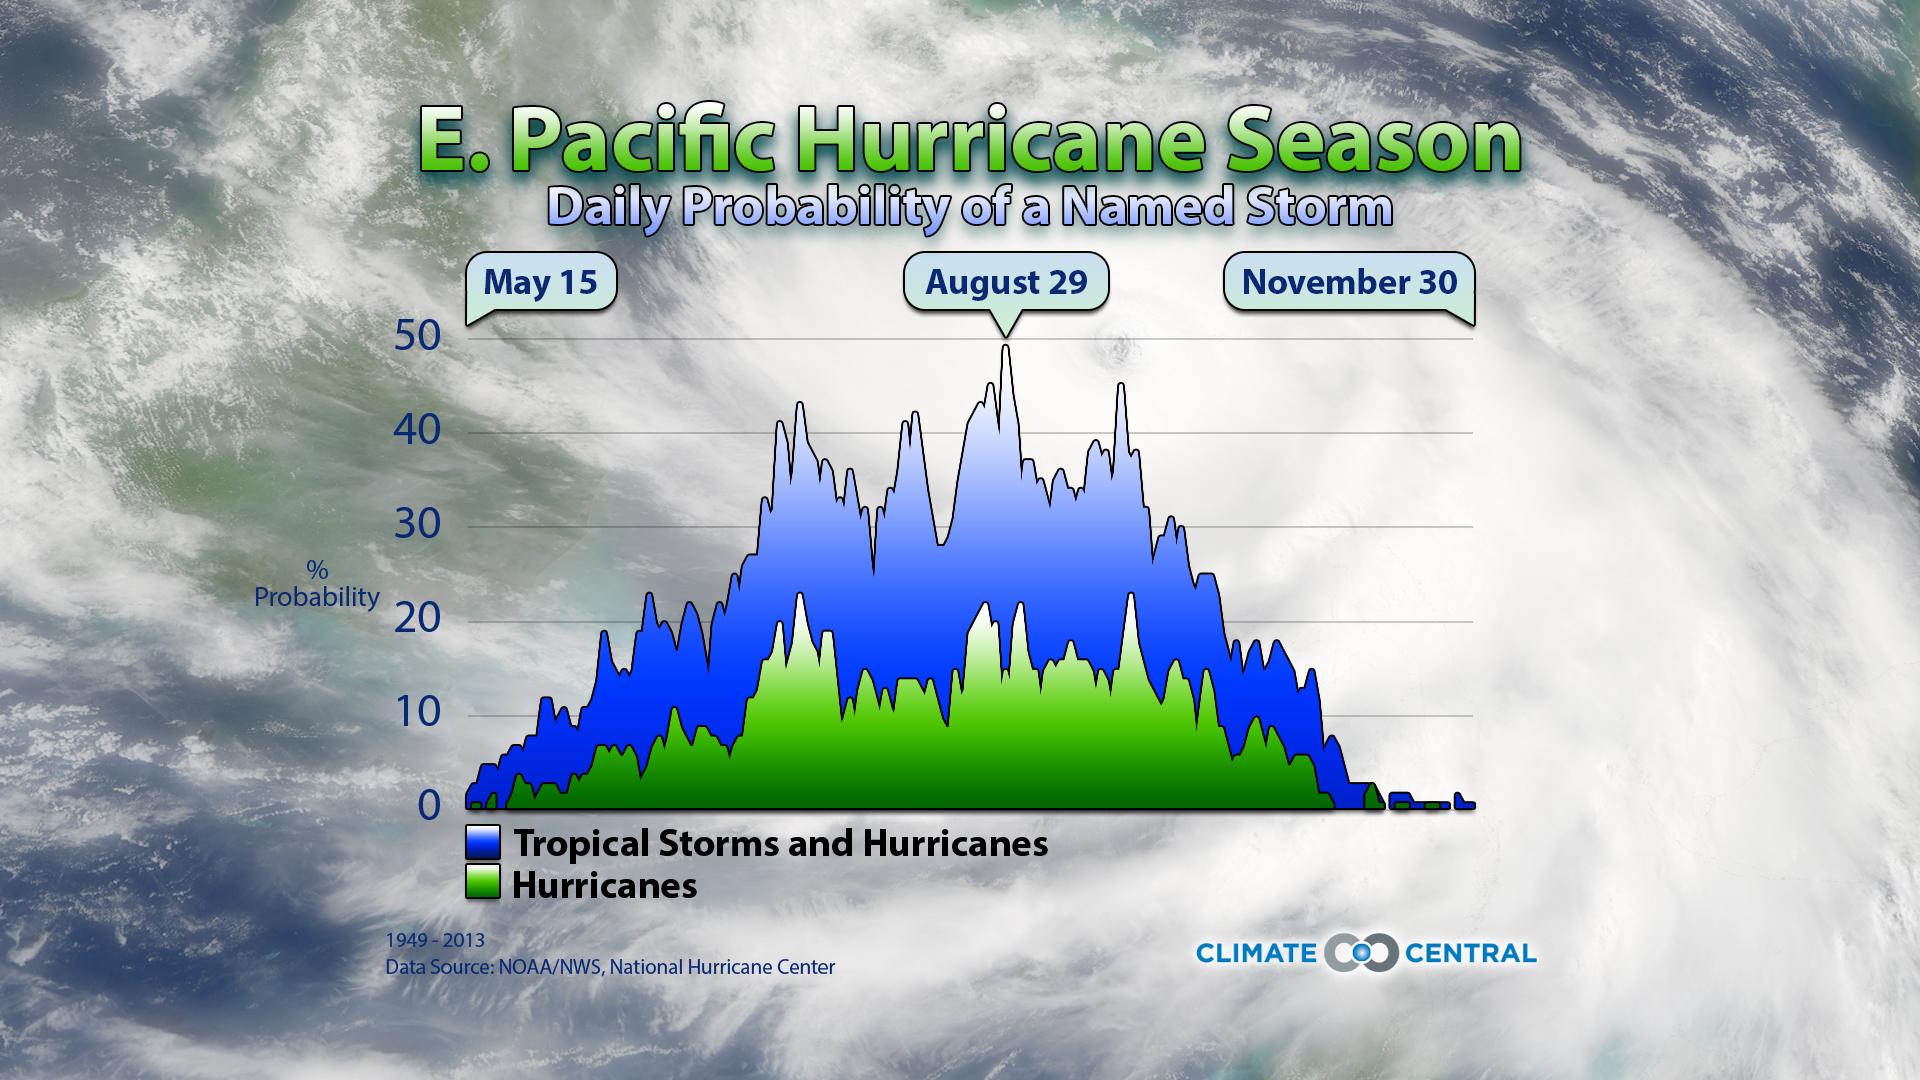 Eastern Pacific Hurricane Season